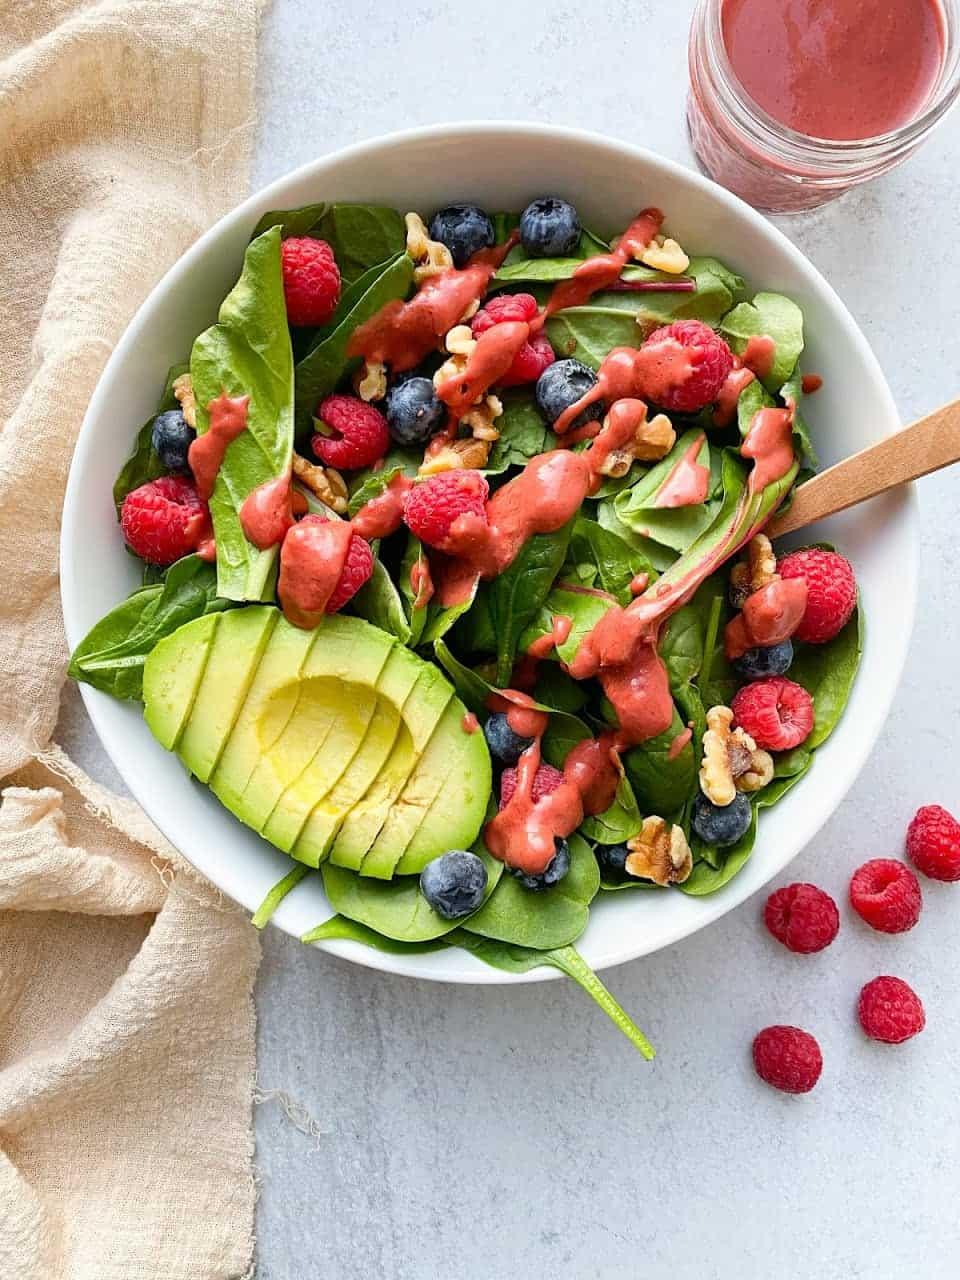 Berry Salad with Homemade Raspberry Vinaigrette on white serving bowl